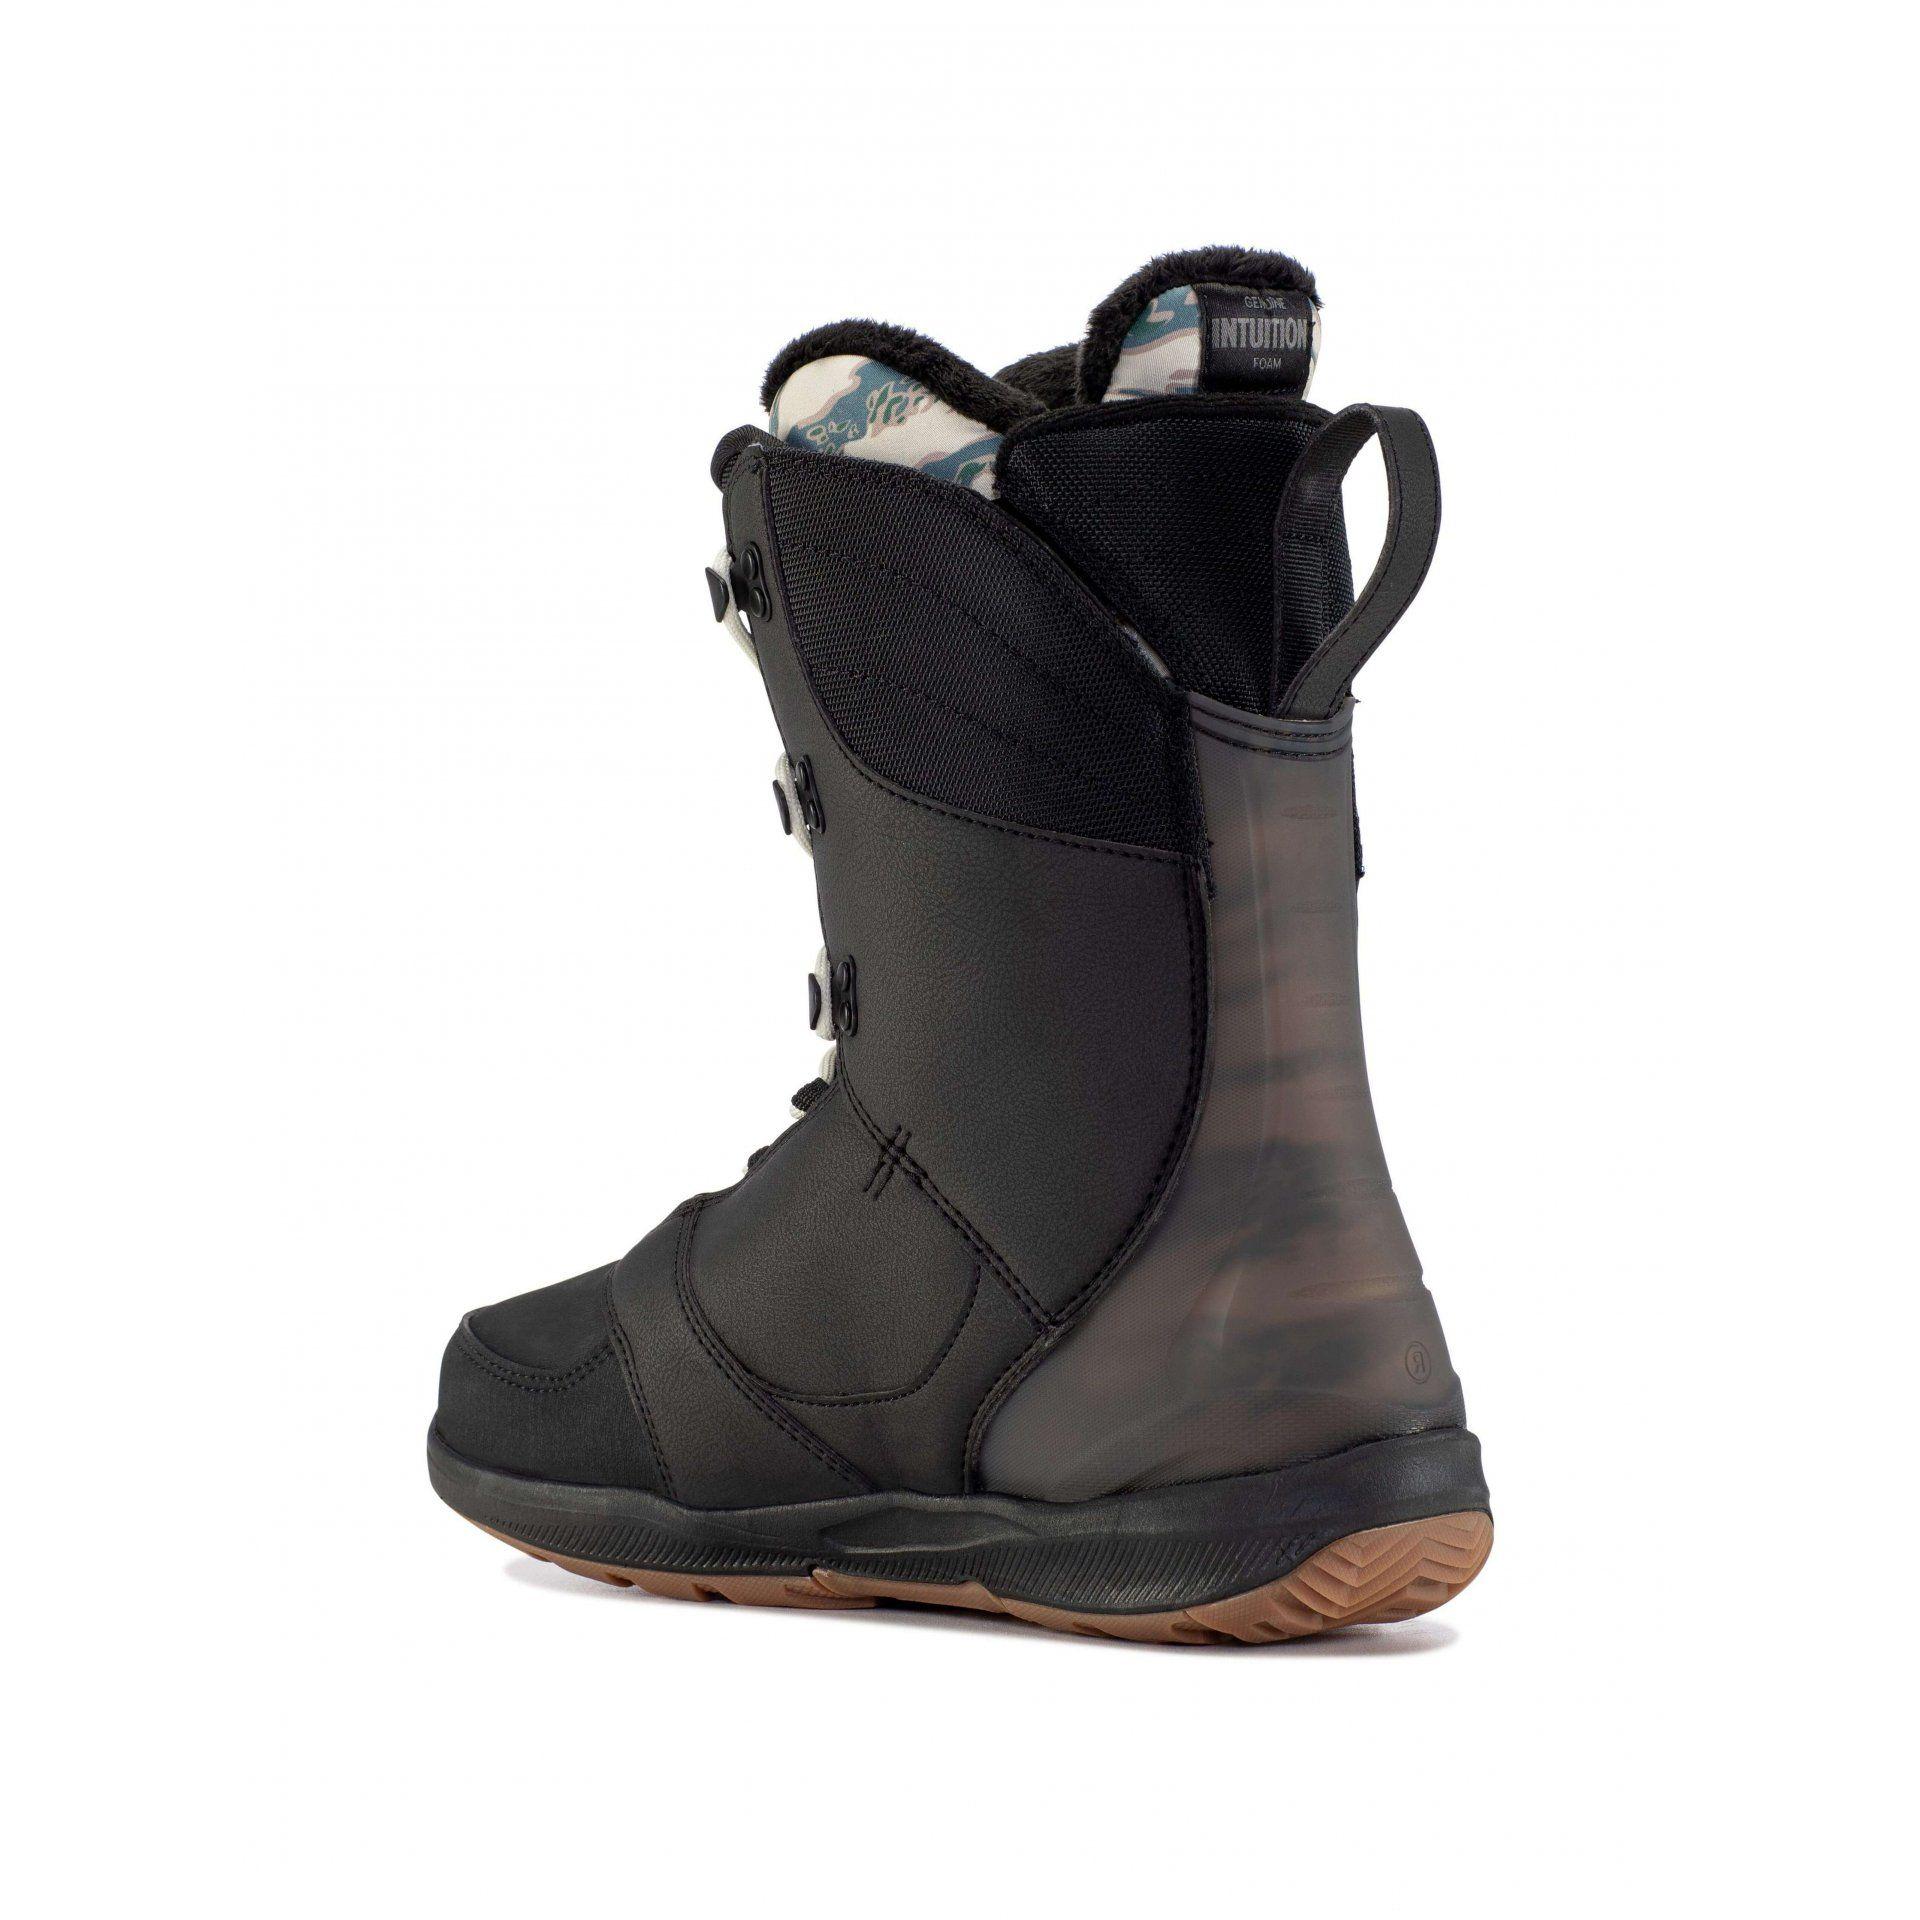 BUTY SNOWBOARDOWE RIDE CONTEXT 104153 BLACK 3